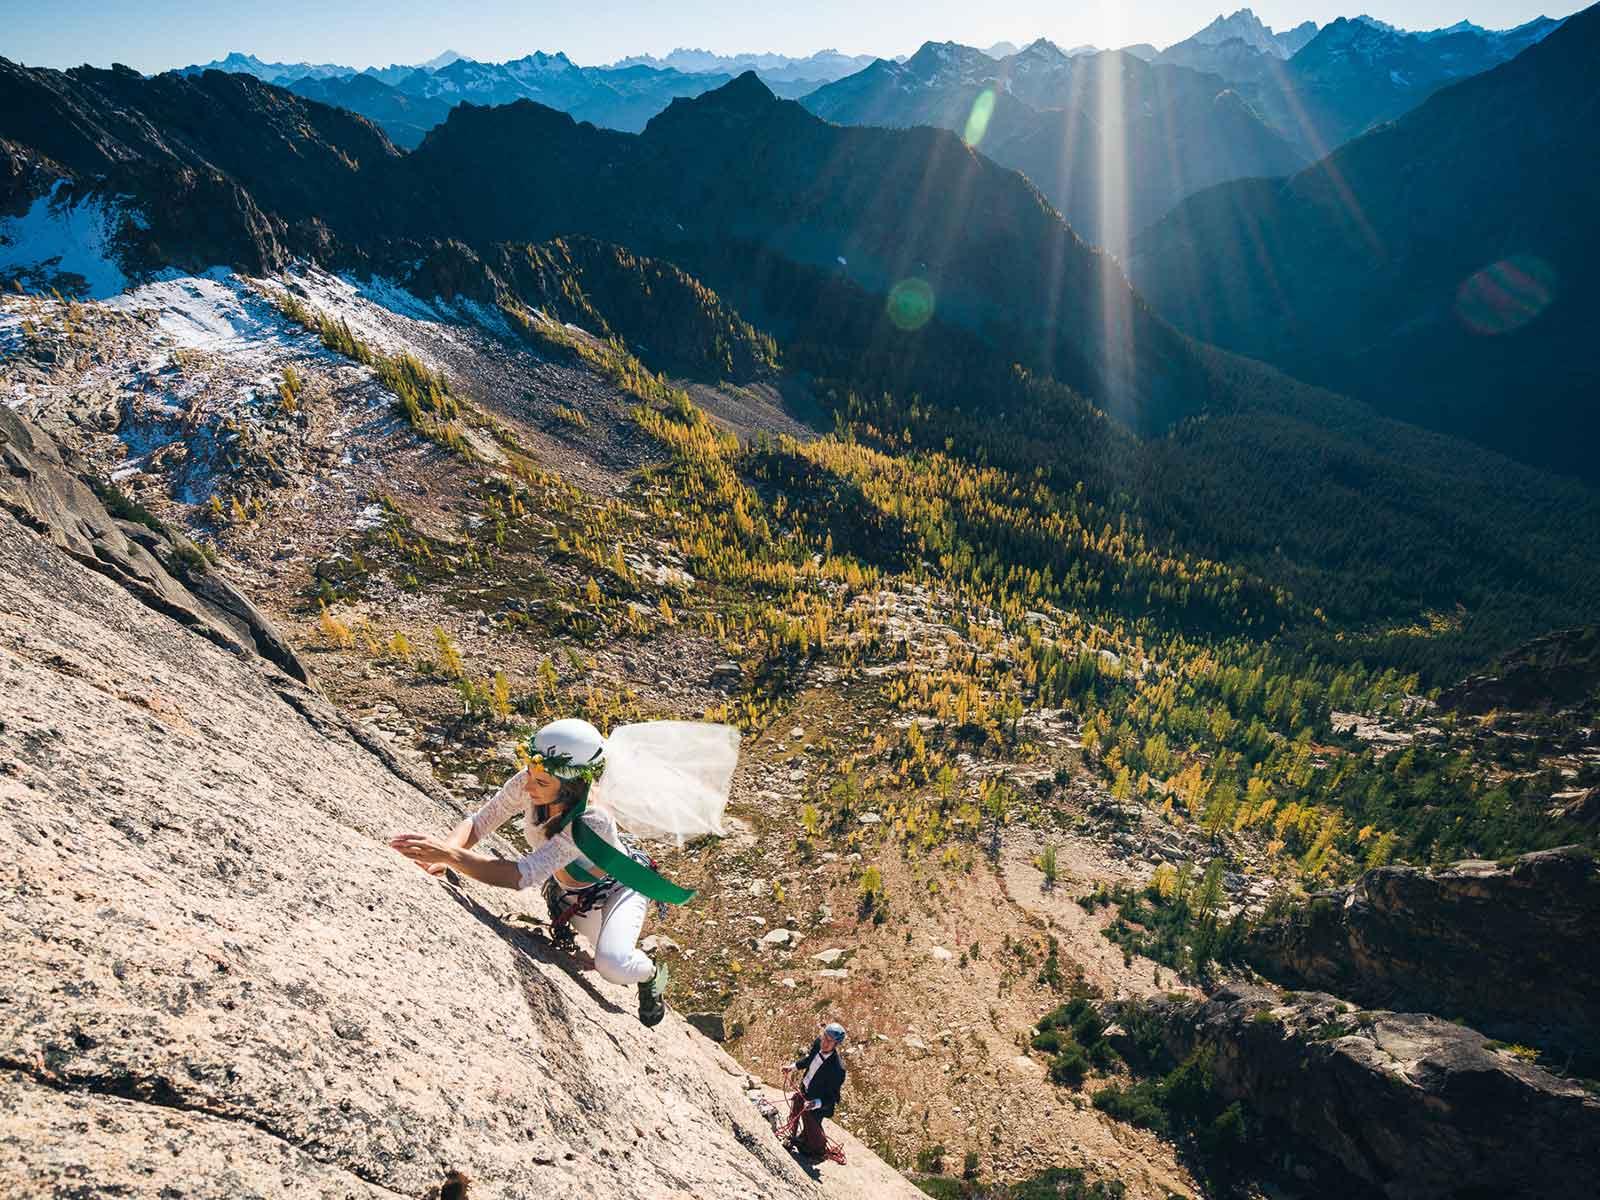 kelsey andy rock climbing